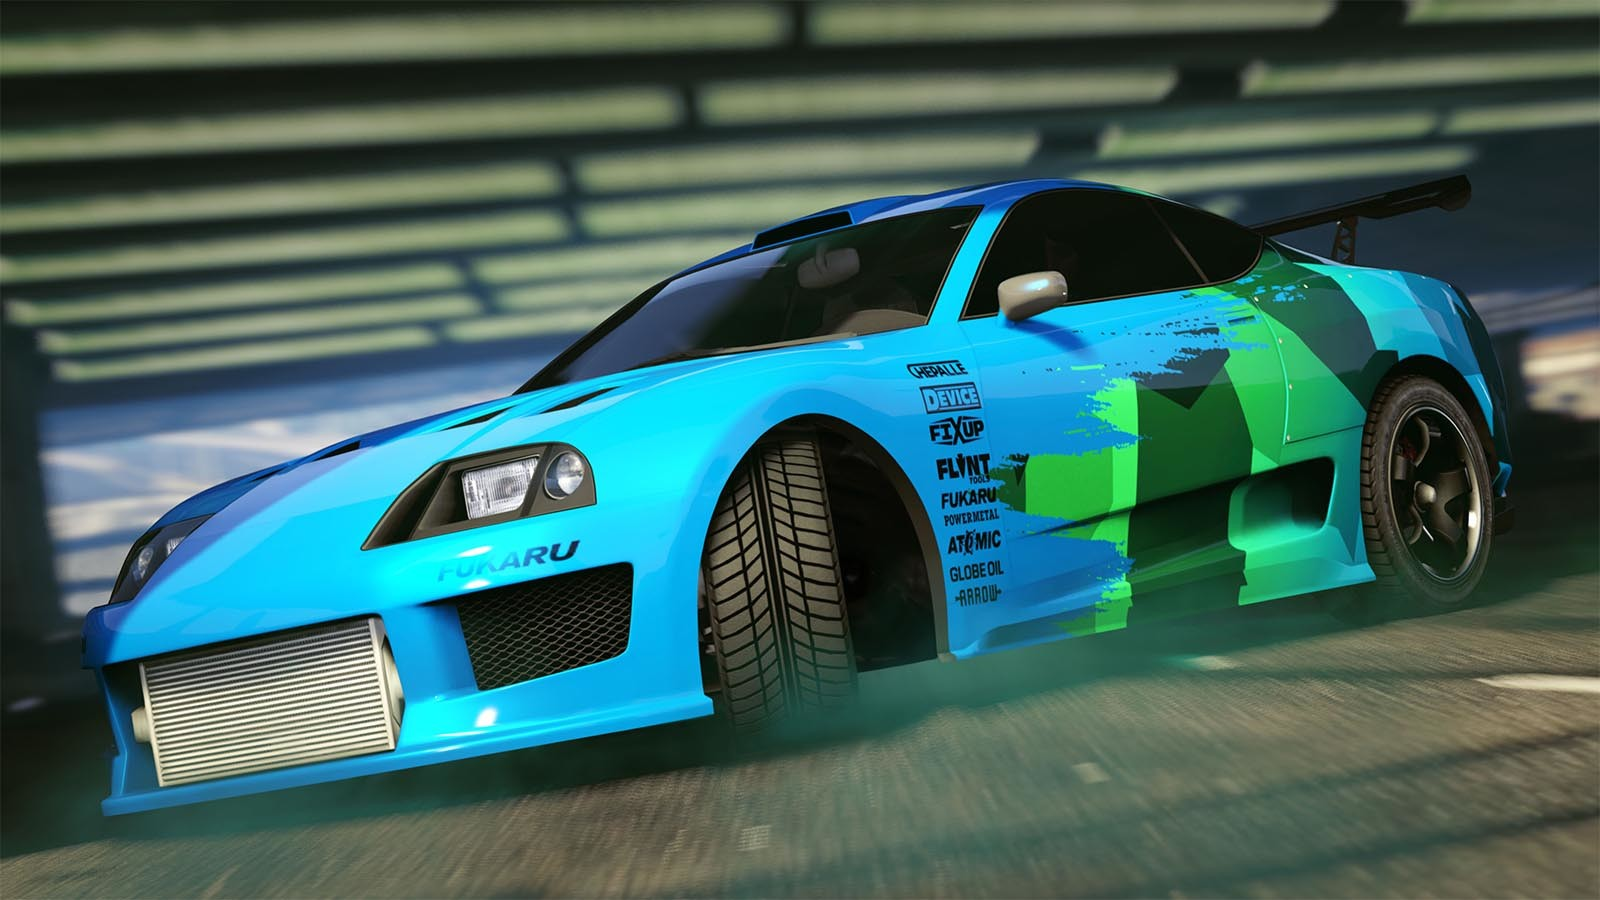 Grand Theft Auto V [Rockstar Social Club CD Key] for PC - Buy now